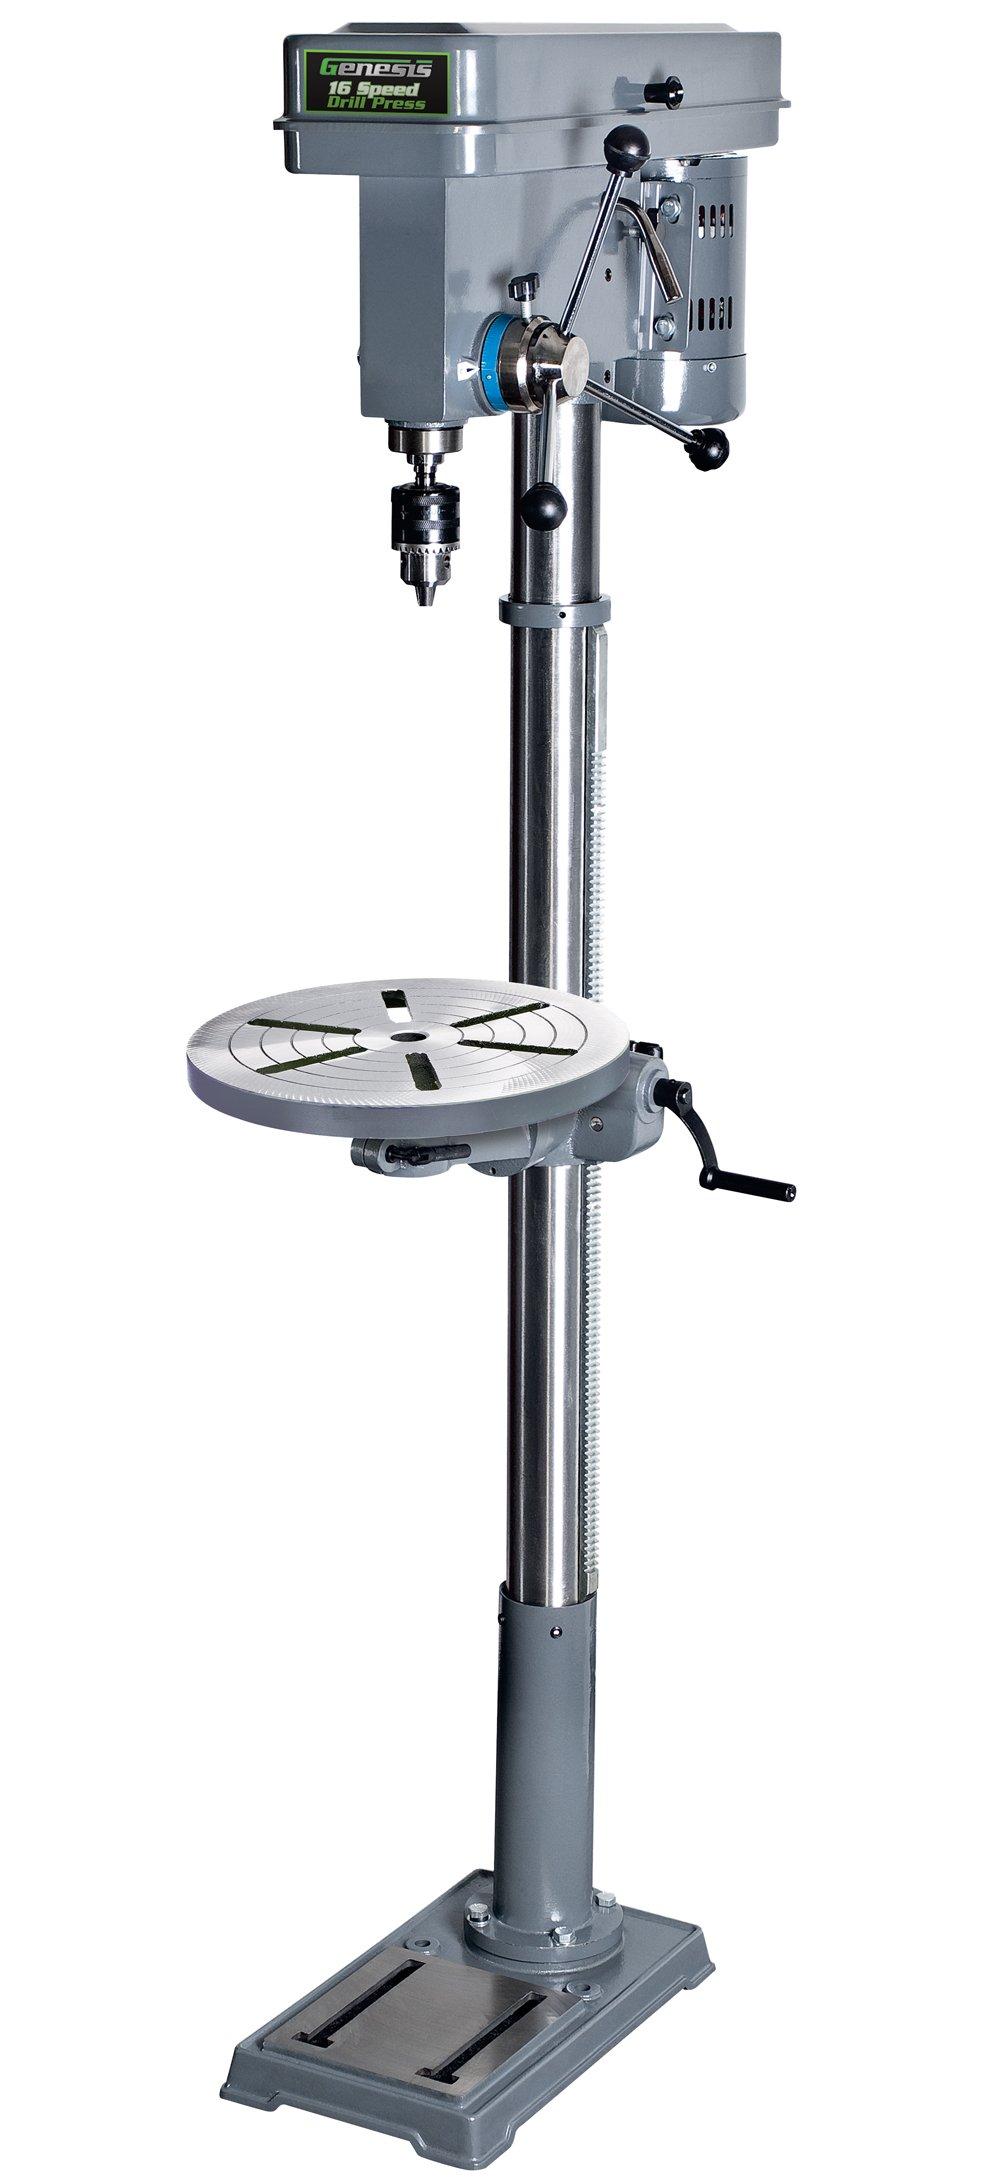 Genesis GFDP160 13-Inch 16-Speed Floor Stand Drill Press